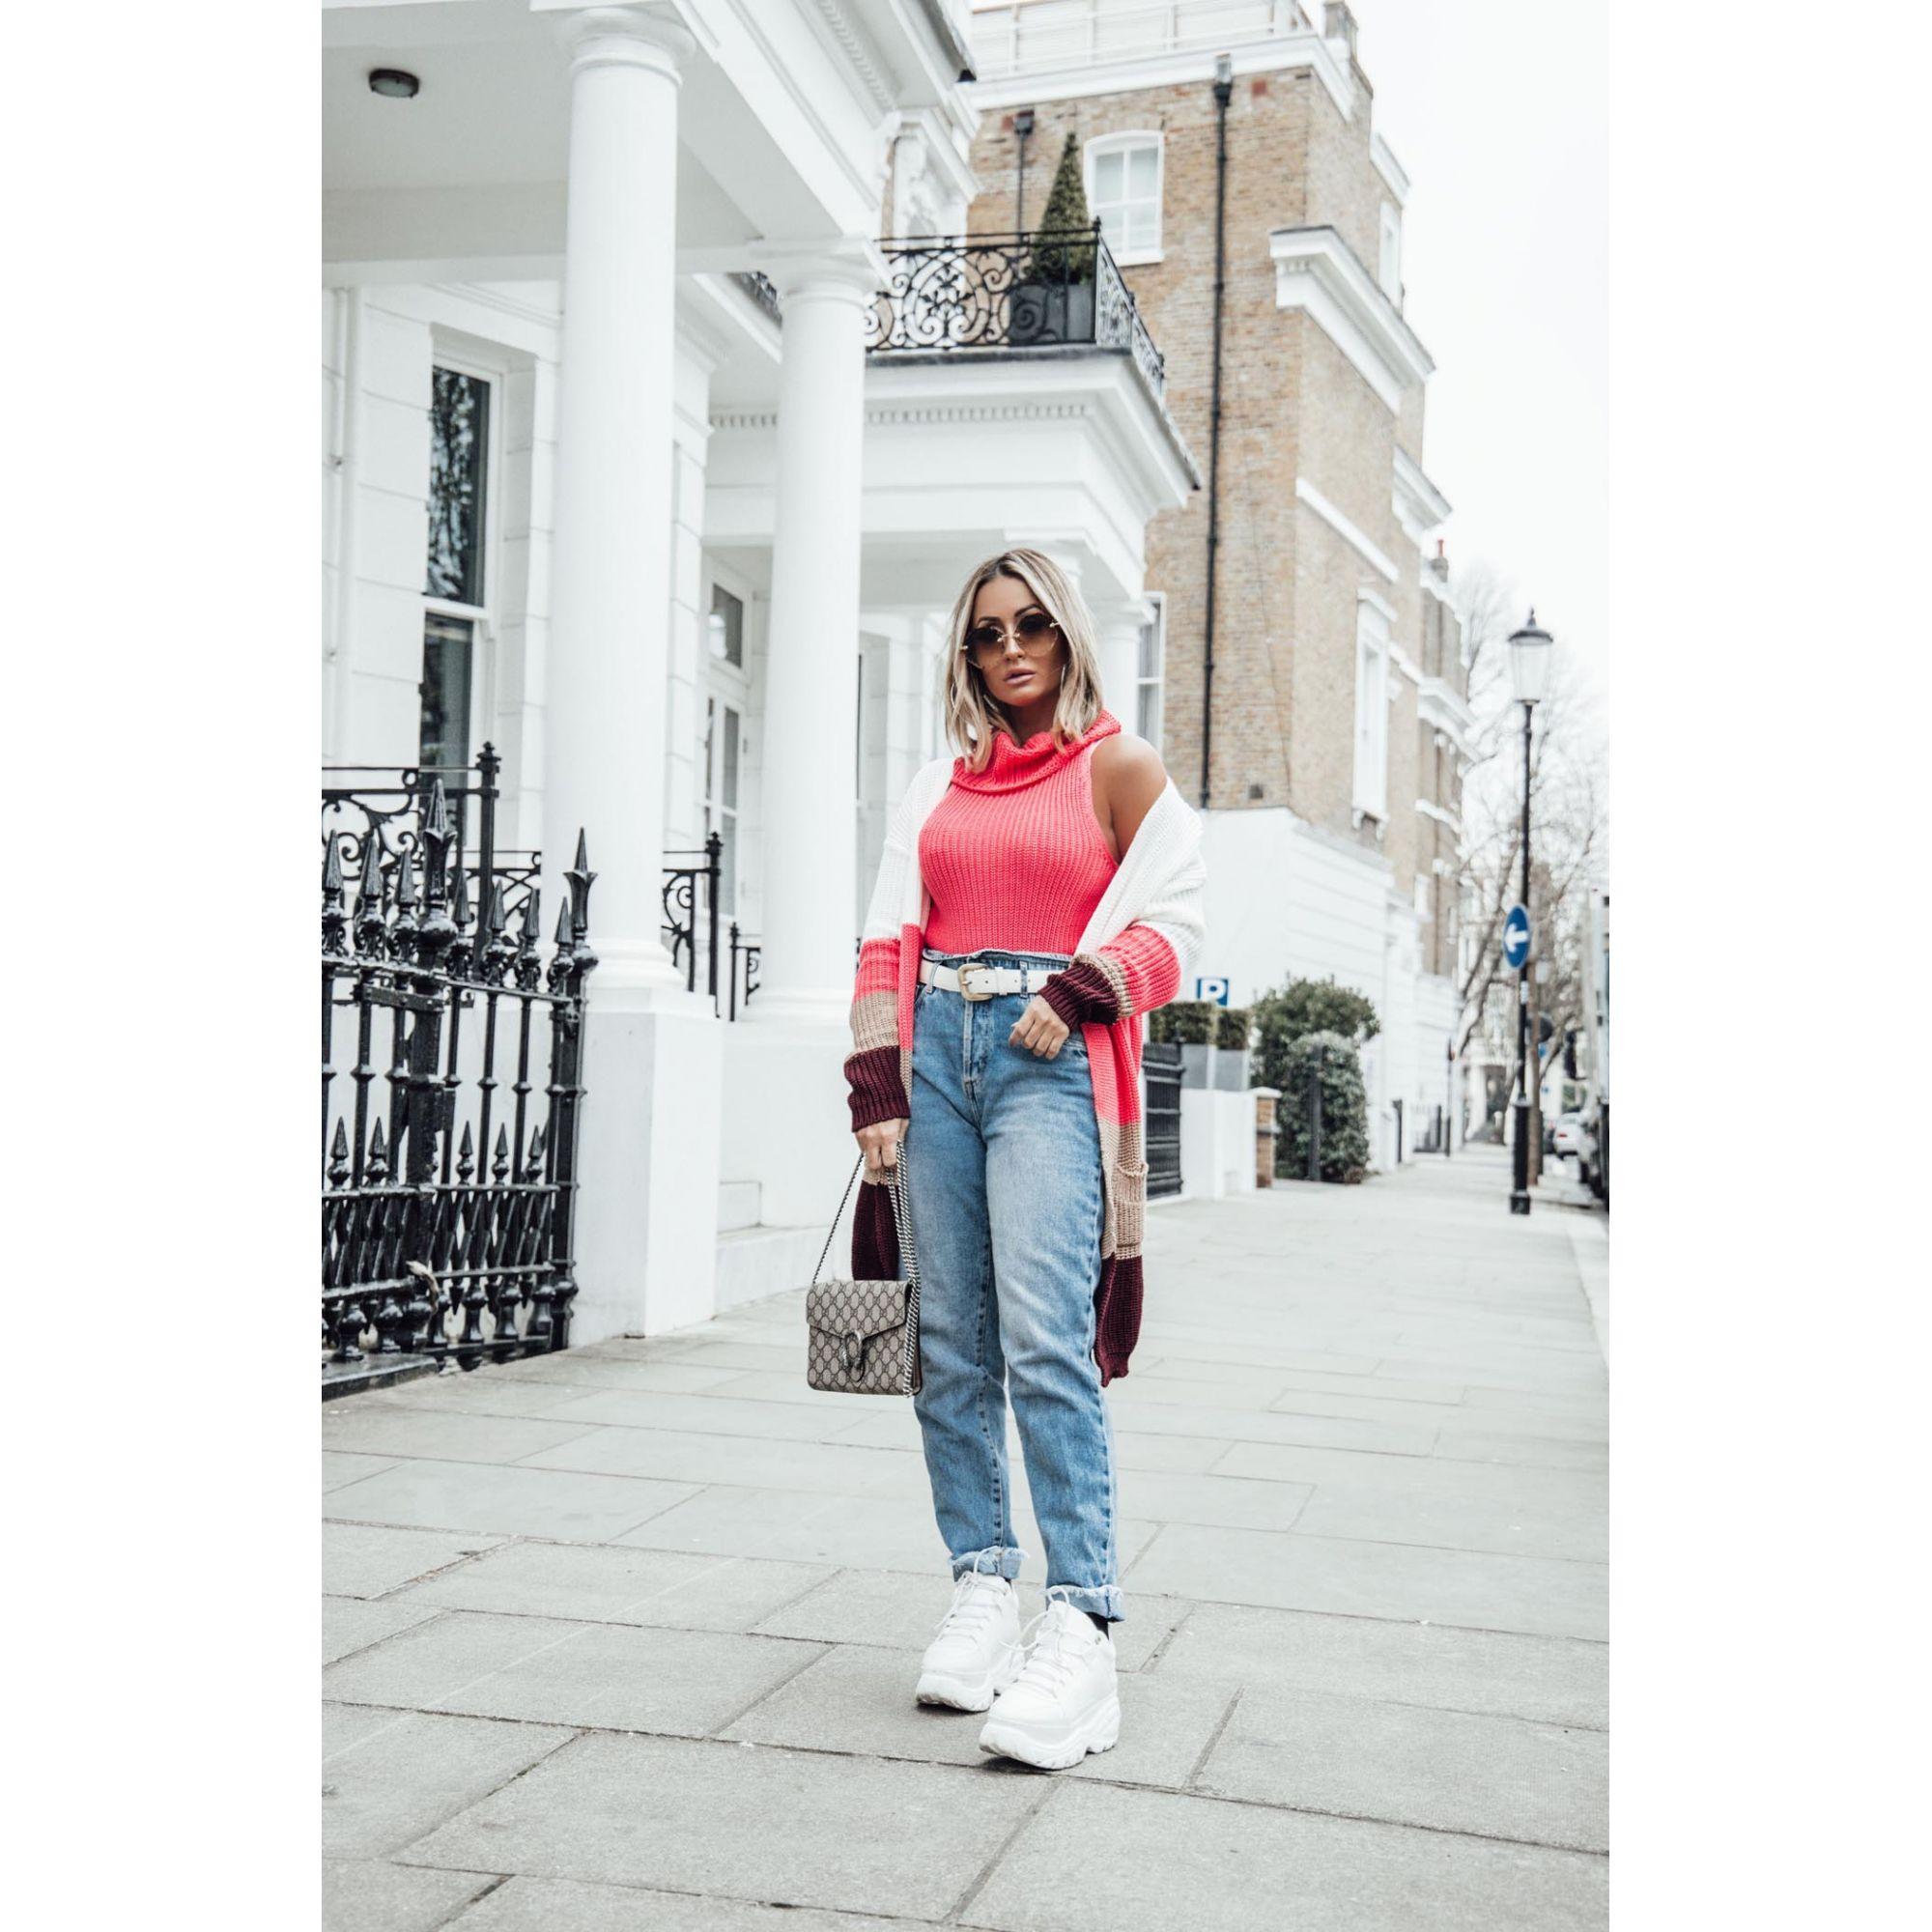 Blusa Regata Vera Tricot Feminino Pink Neon